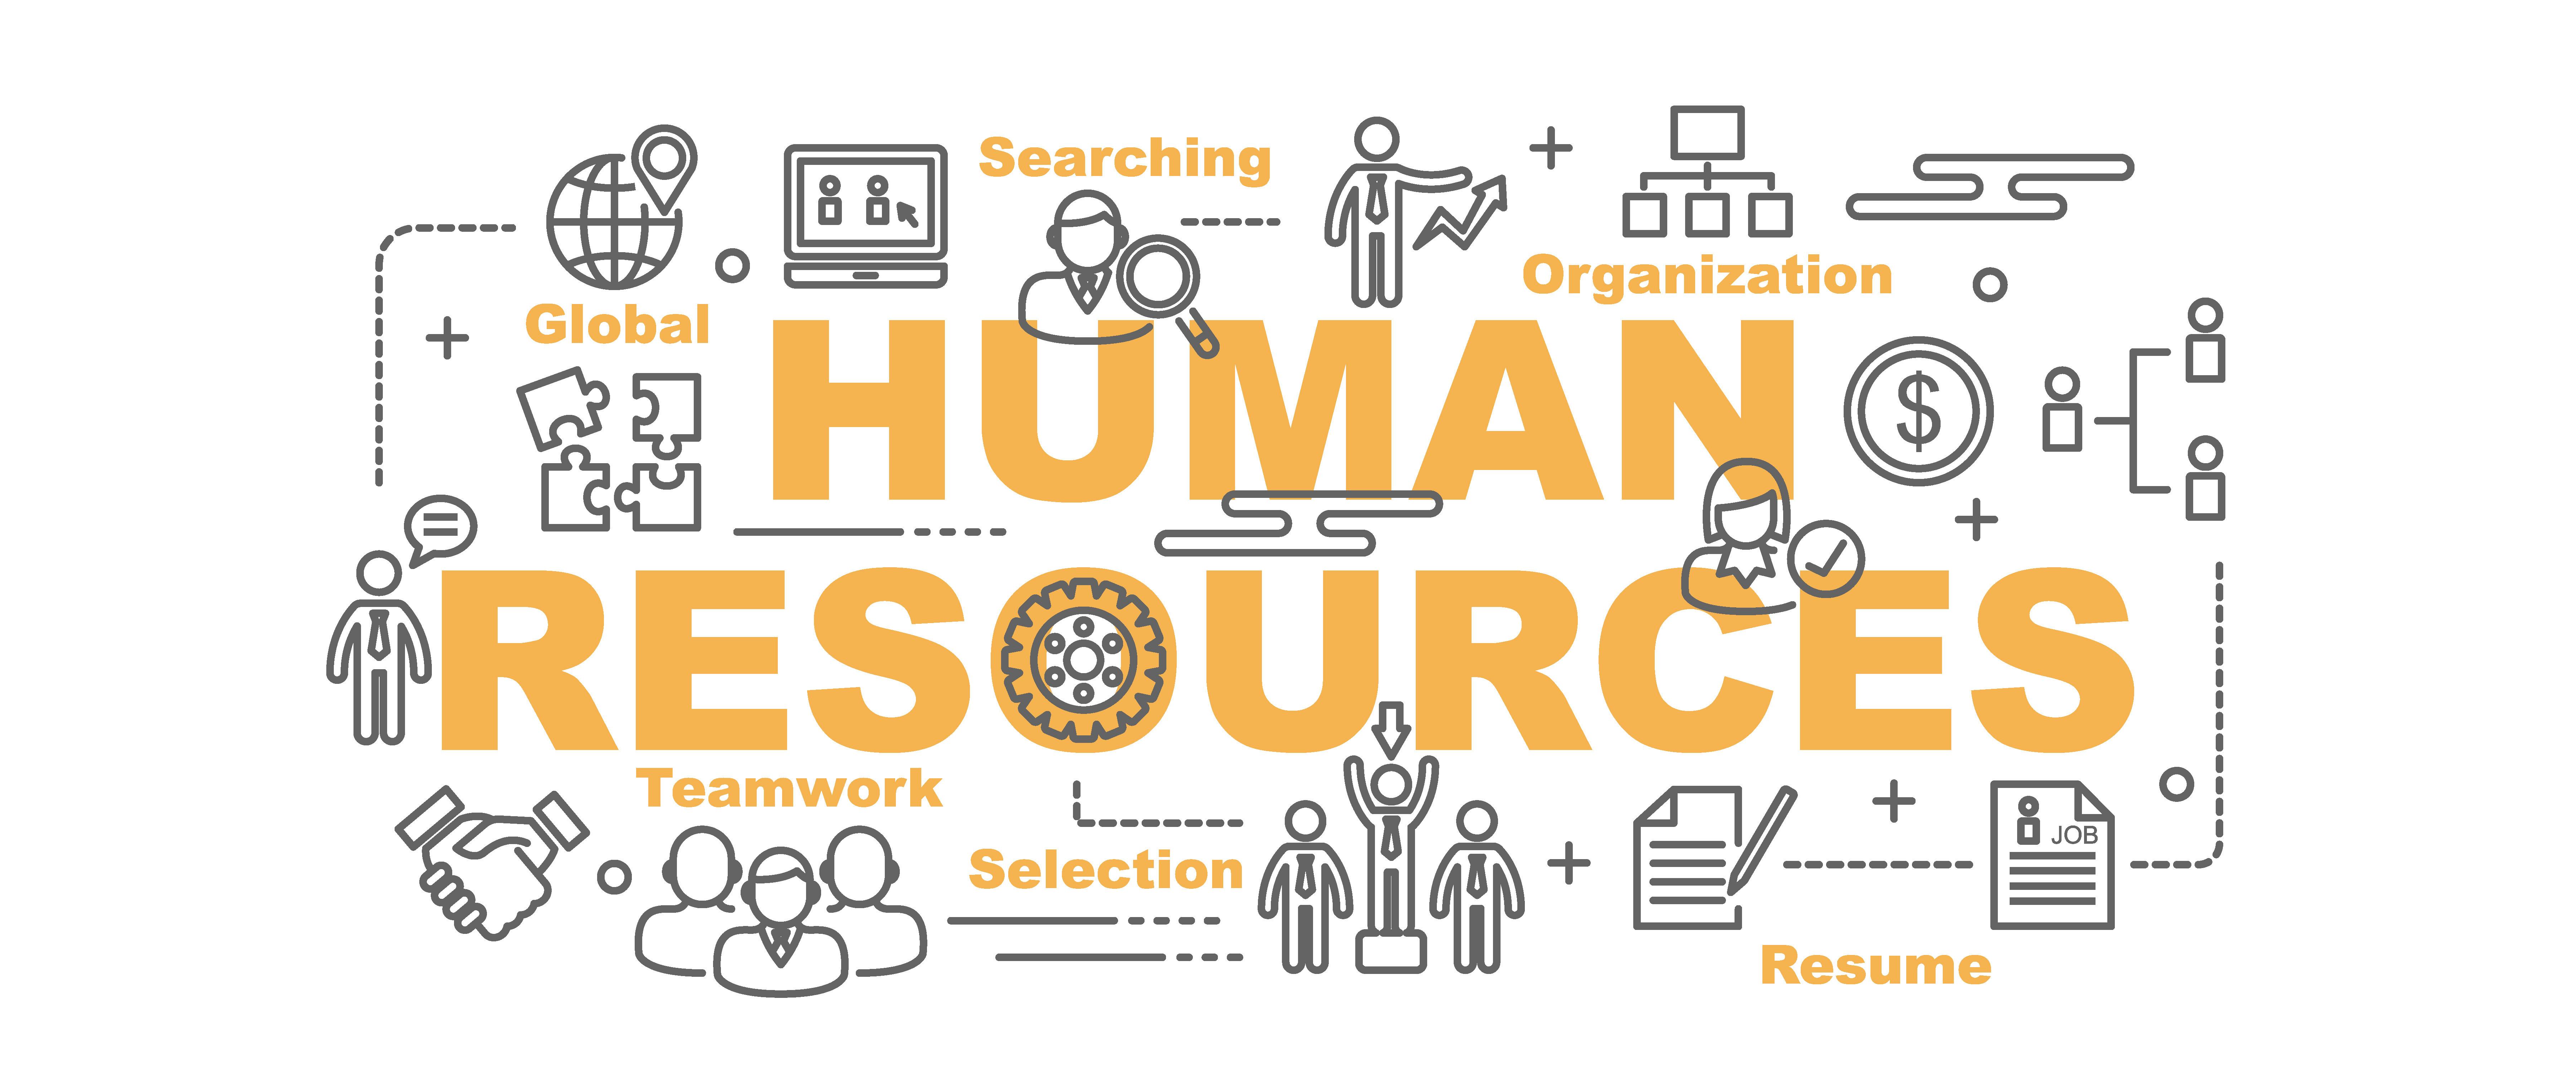 Boomi and HR: SuccessFactors at SAP's SuccessConnect 2017 in London